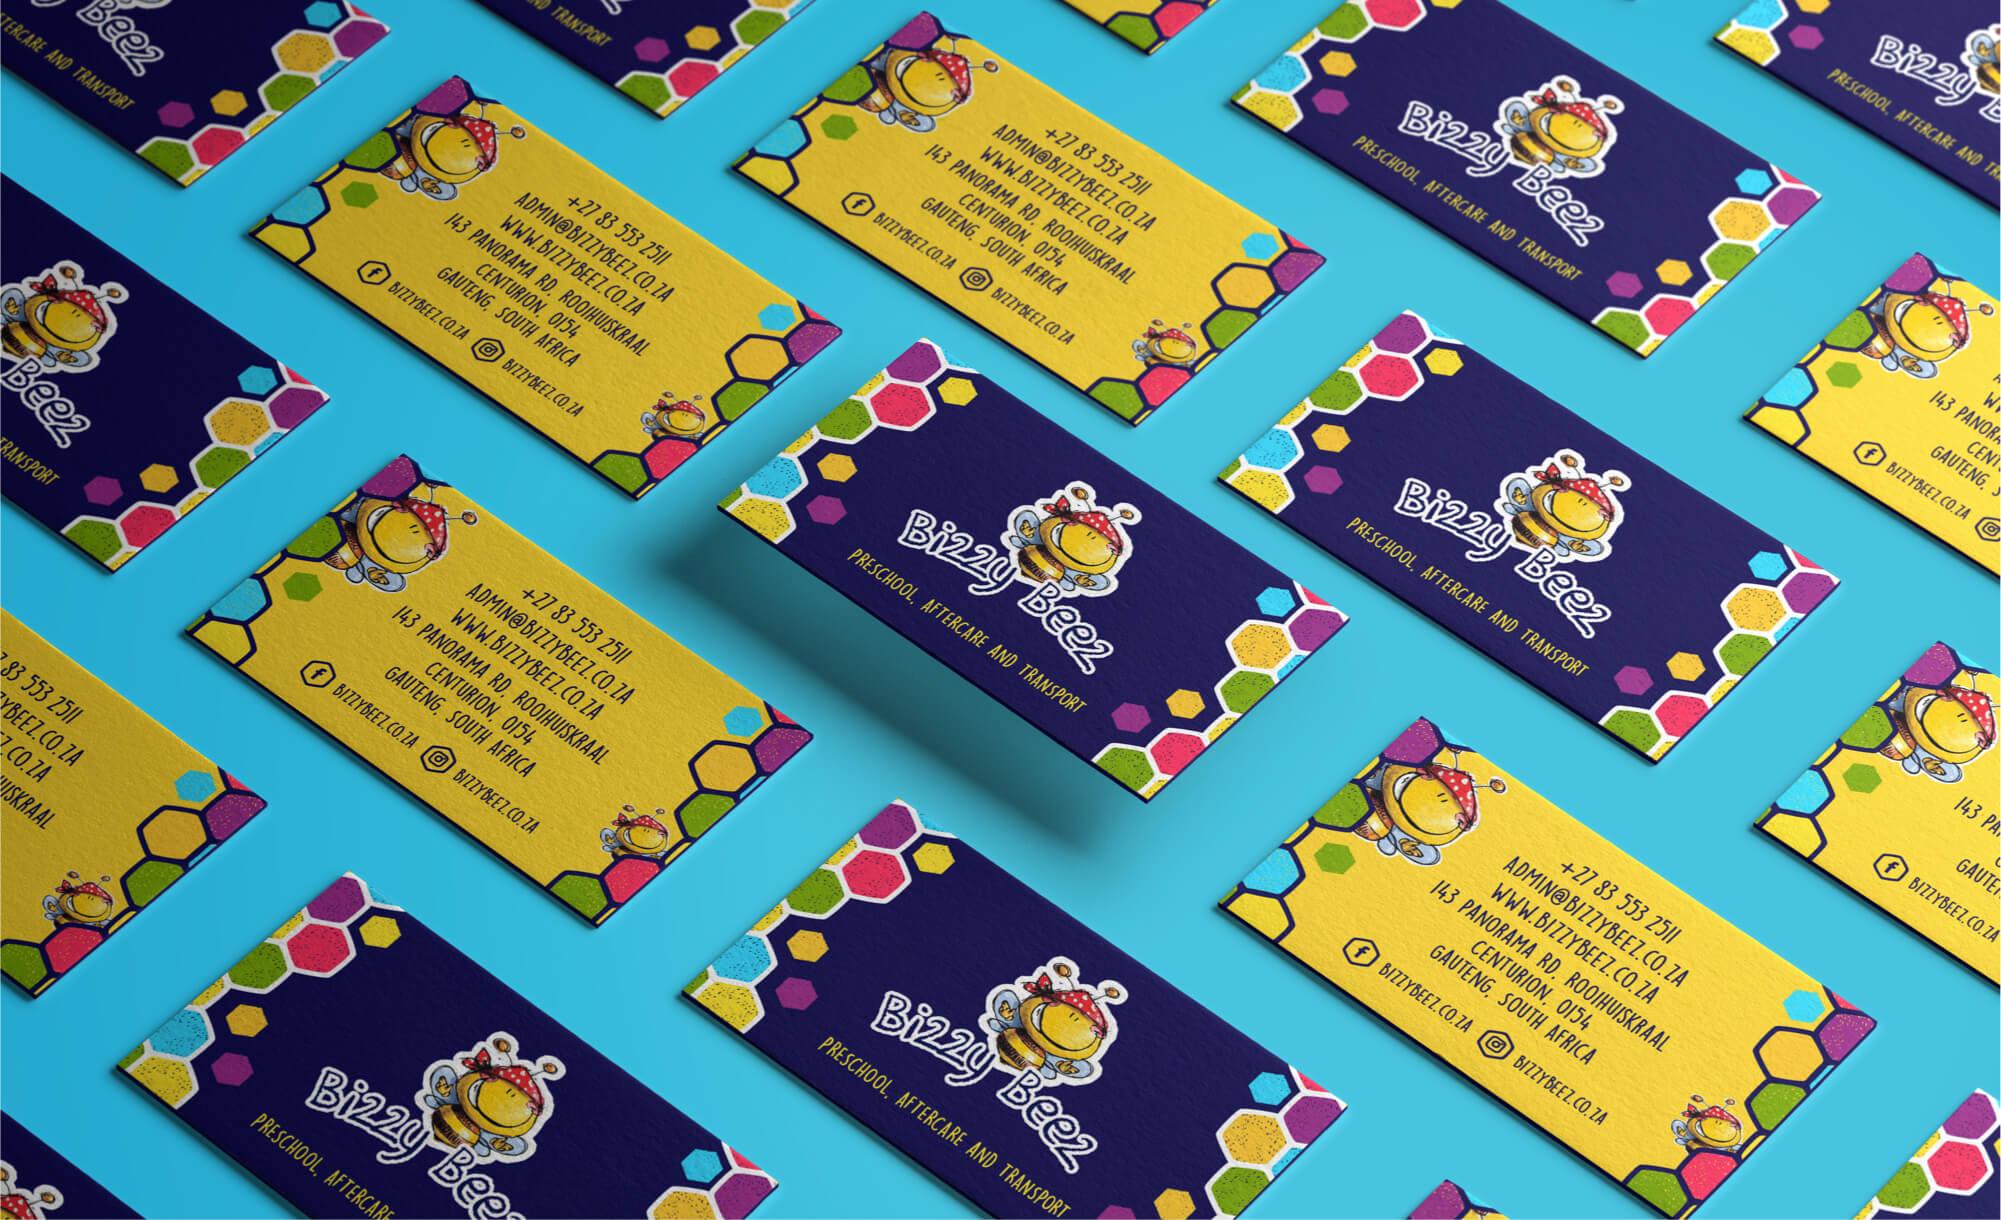 bizzy-beez-school-business-cards-designers-agent-orange-creative-agency-johannesburg-south-africa.jpg